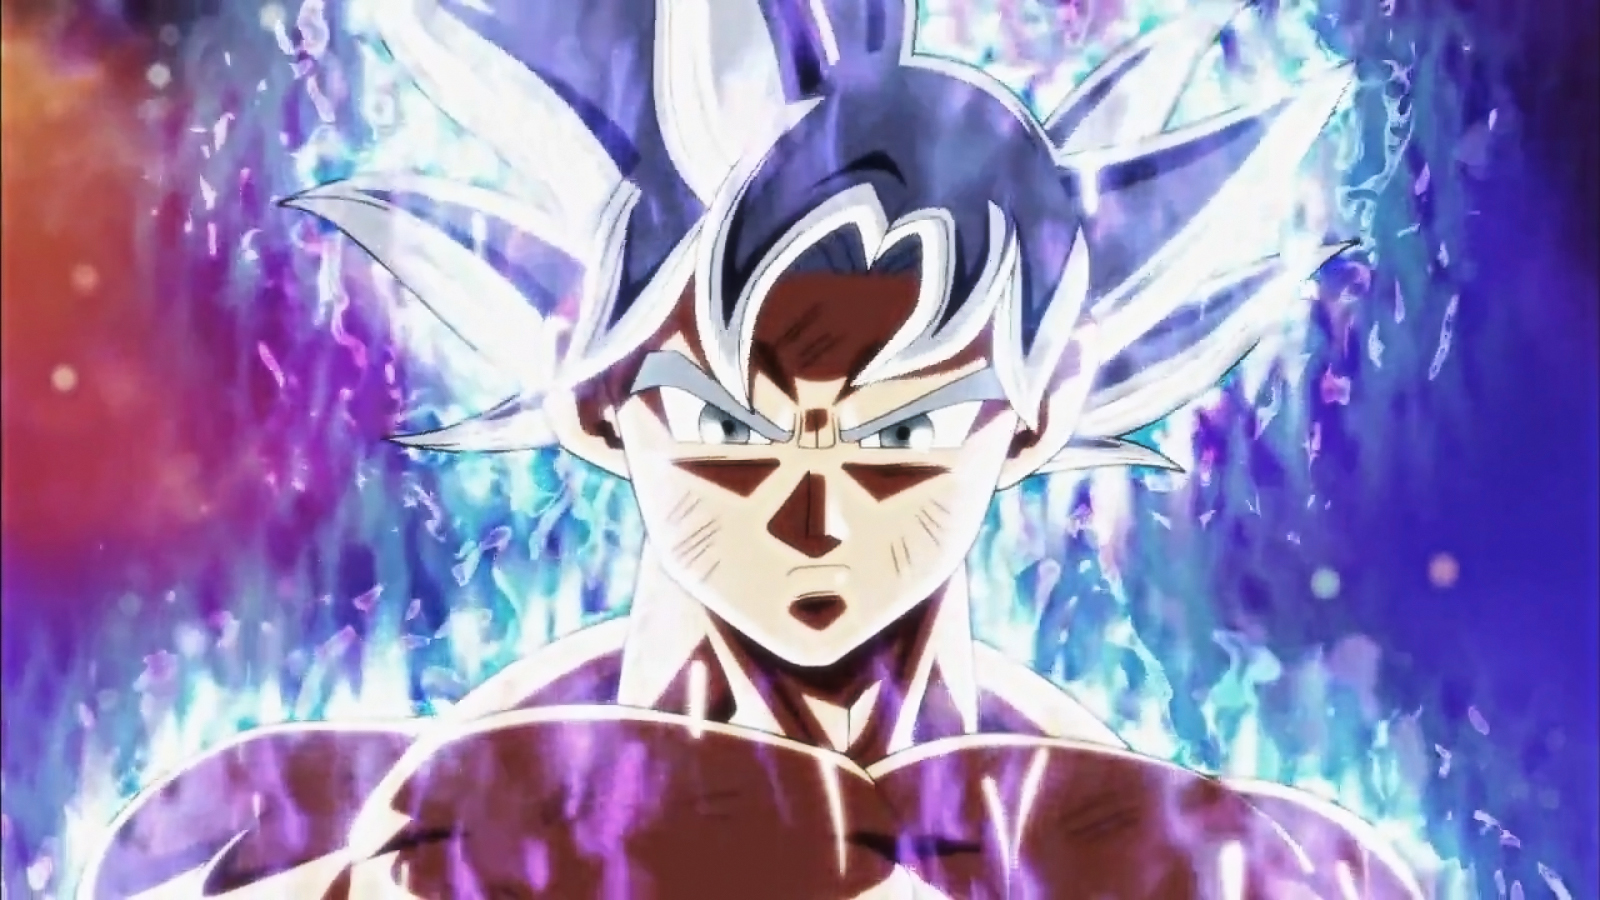 Goku en la forma Ultra Instinto llegará a Dragon Ball FighterZ